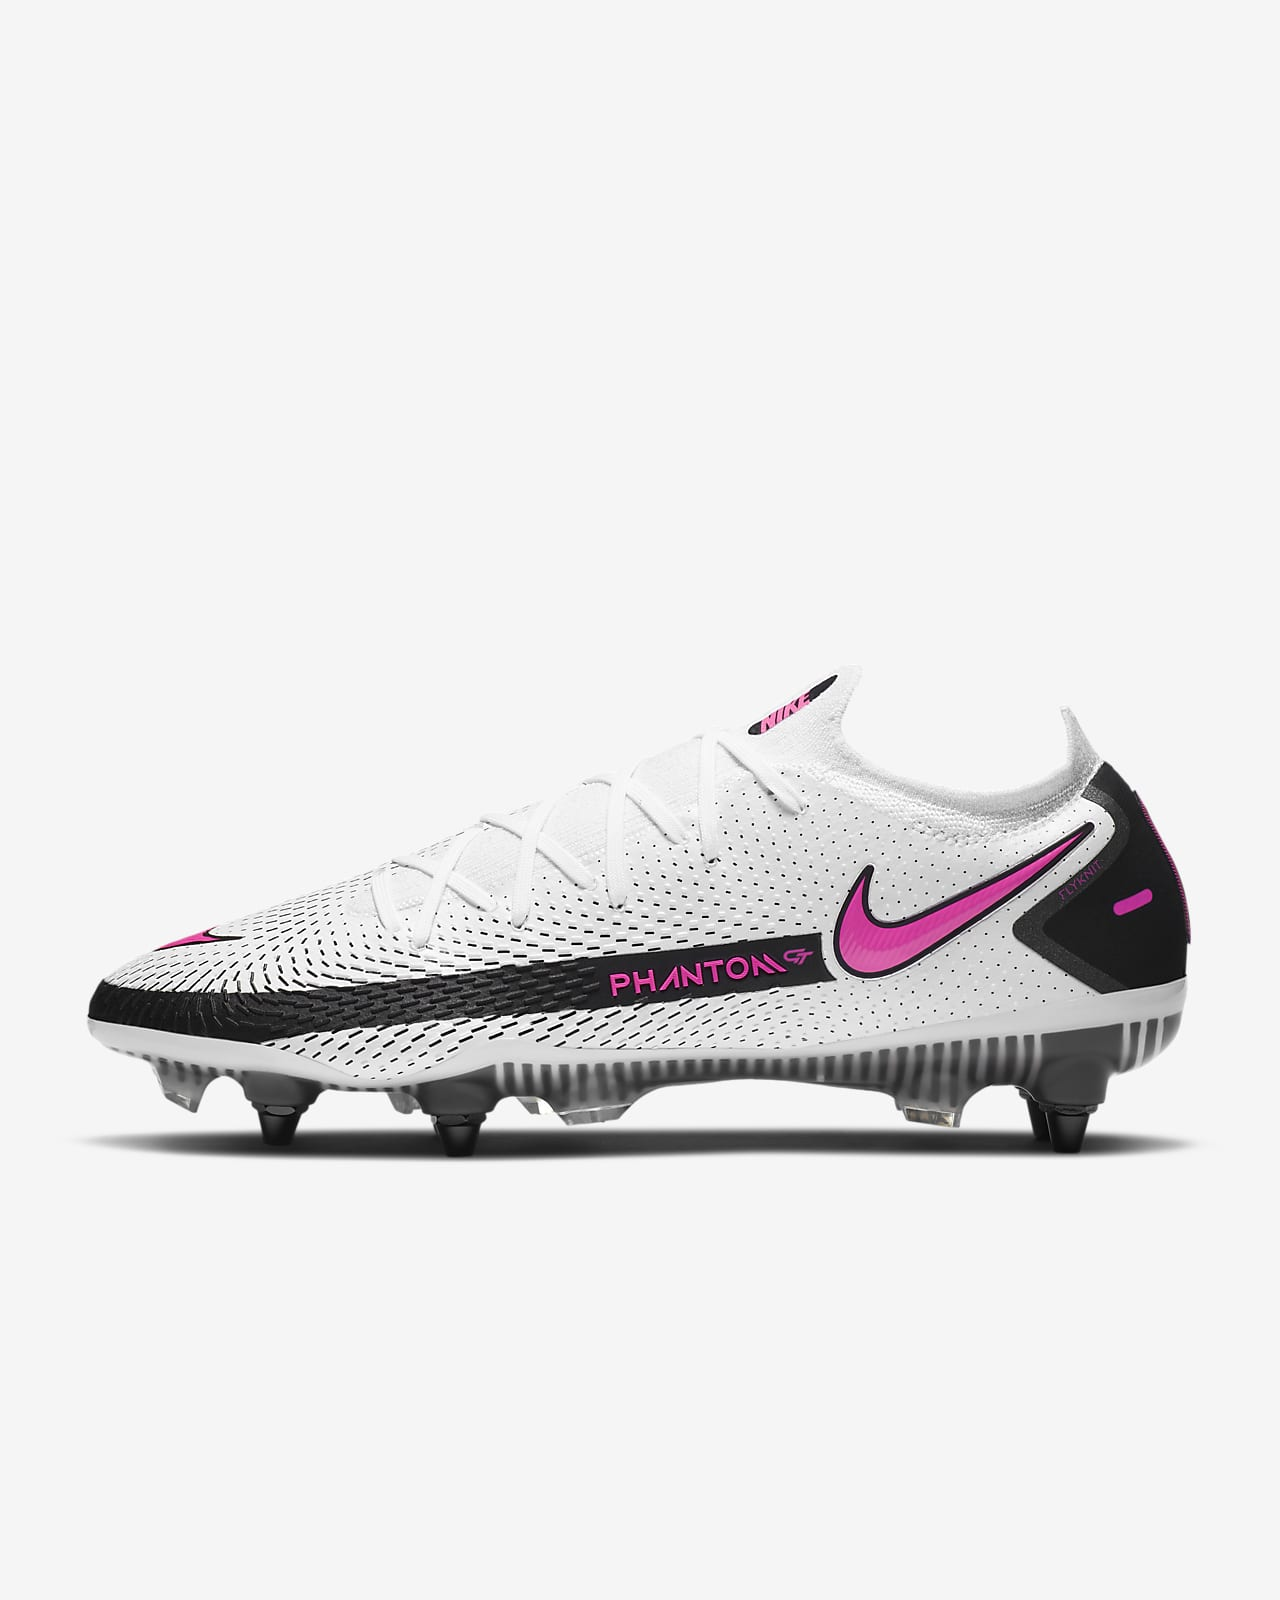 Nike Phantom GT Elite SG-Pro AC Soft-Ground Football Boot